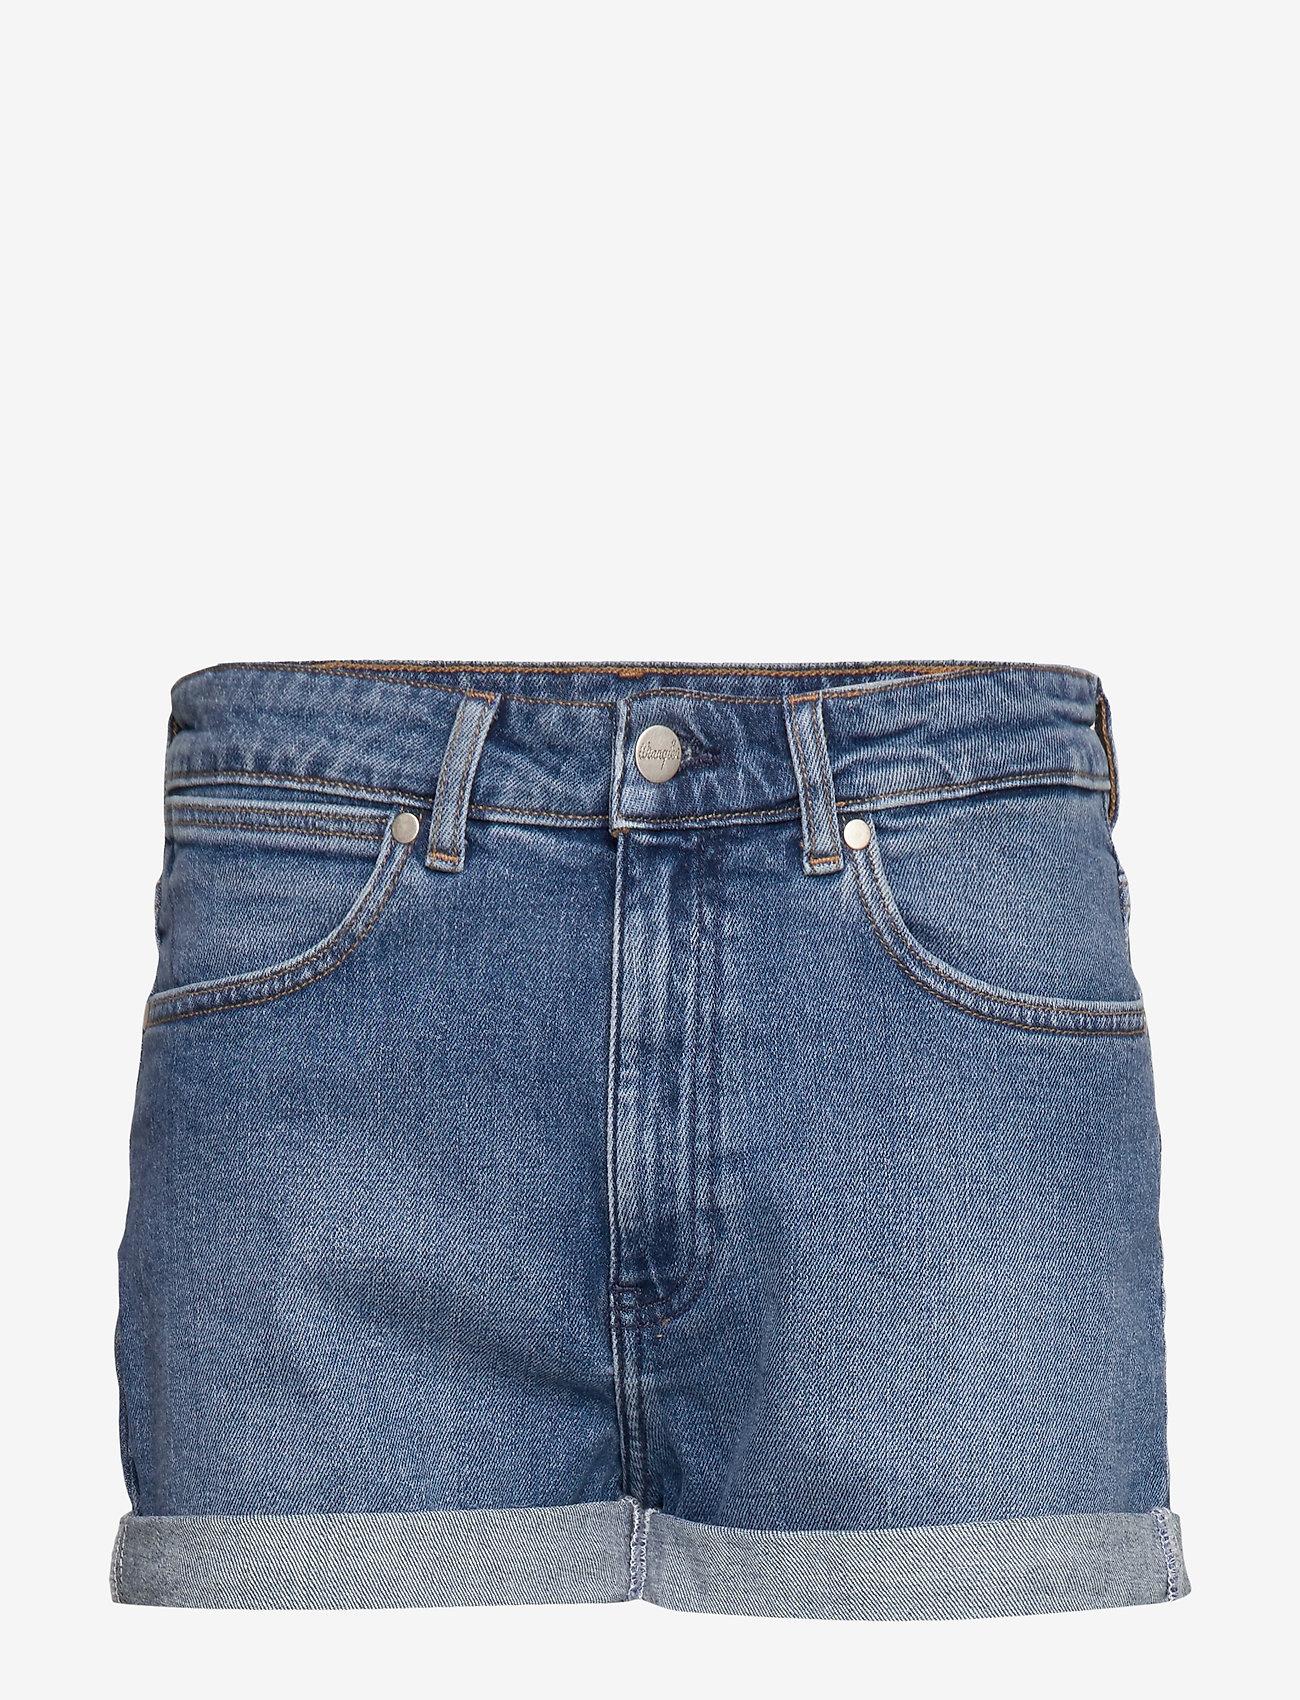 Wrangler - BOYFRIEND SHORT - denim shorts - mid blue - 0